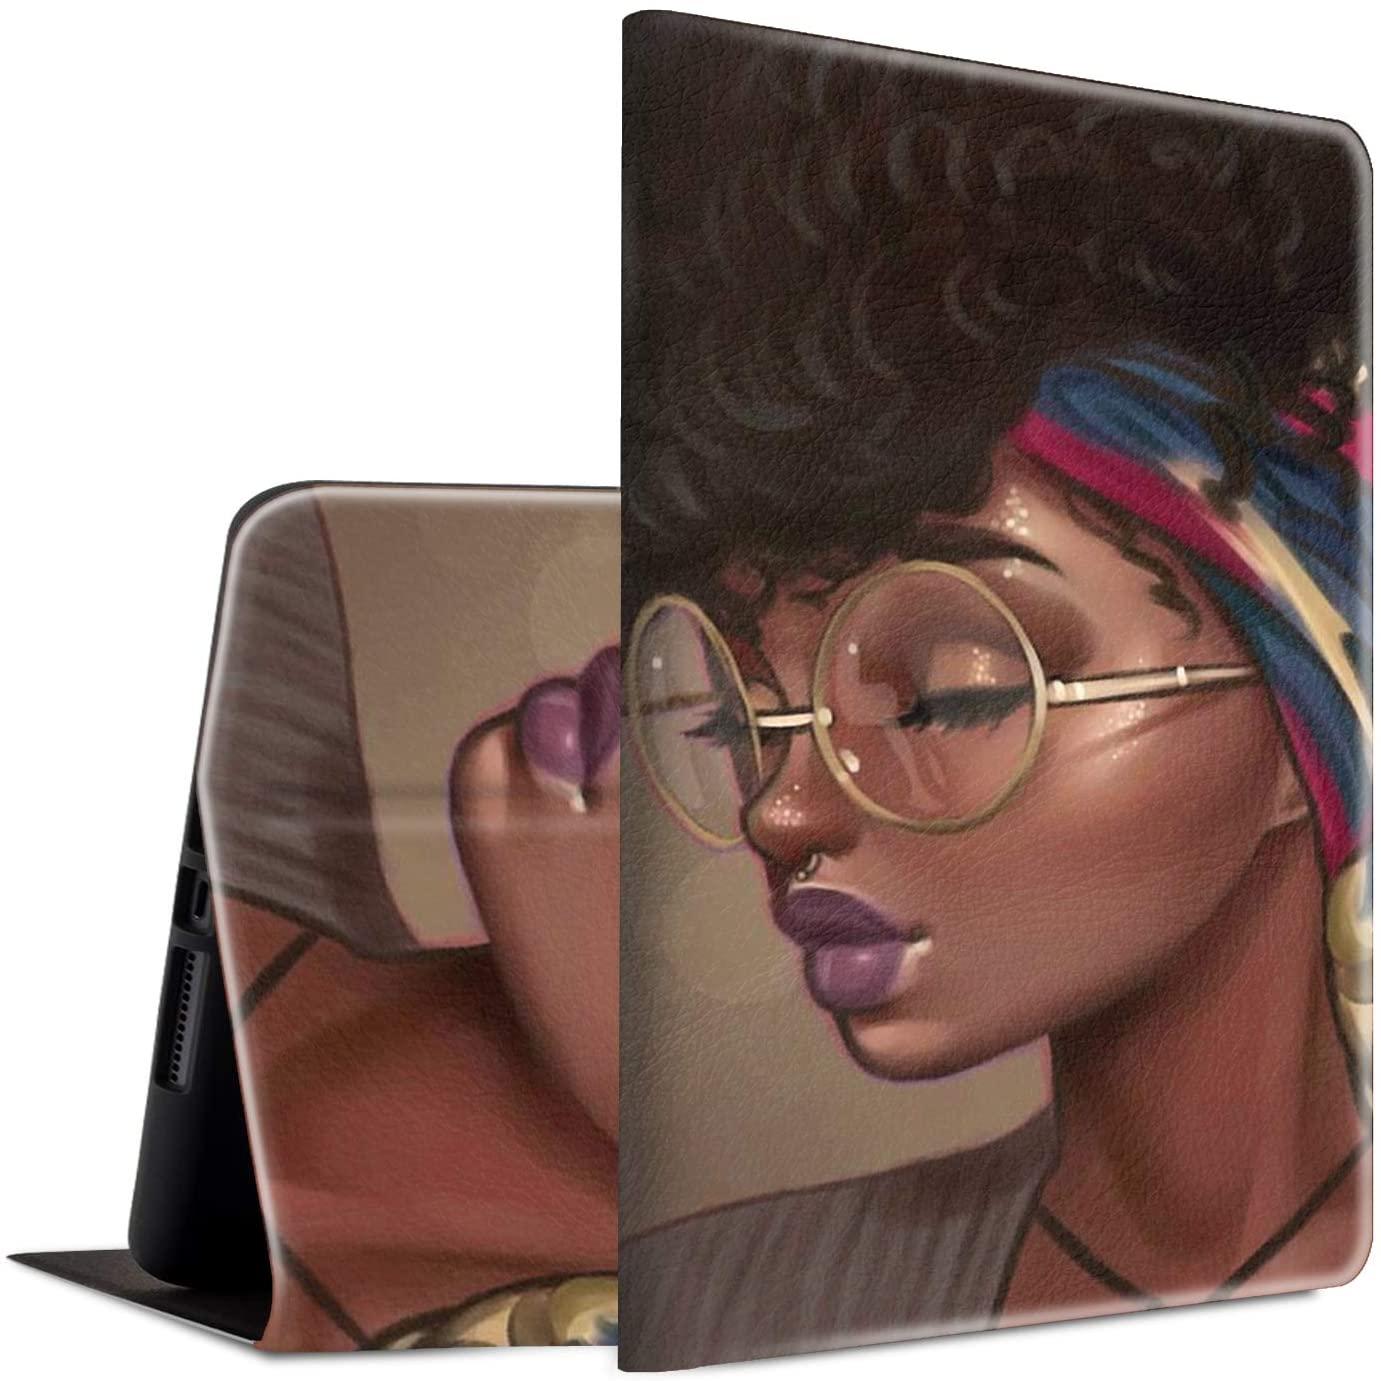 iPad Pro 10.5 / iPad Air 3 2019 Case, Spsun Lightweight PU Leather Folio Adjustable Stand with Auto Wake/Sleep Smart Protect Case for Apple iPad Air 3/ iPad Pro 10.5 - Afro Hair Black Girl